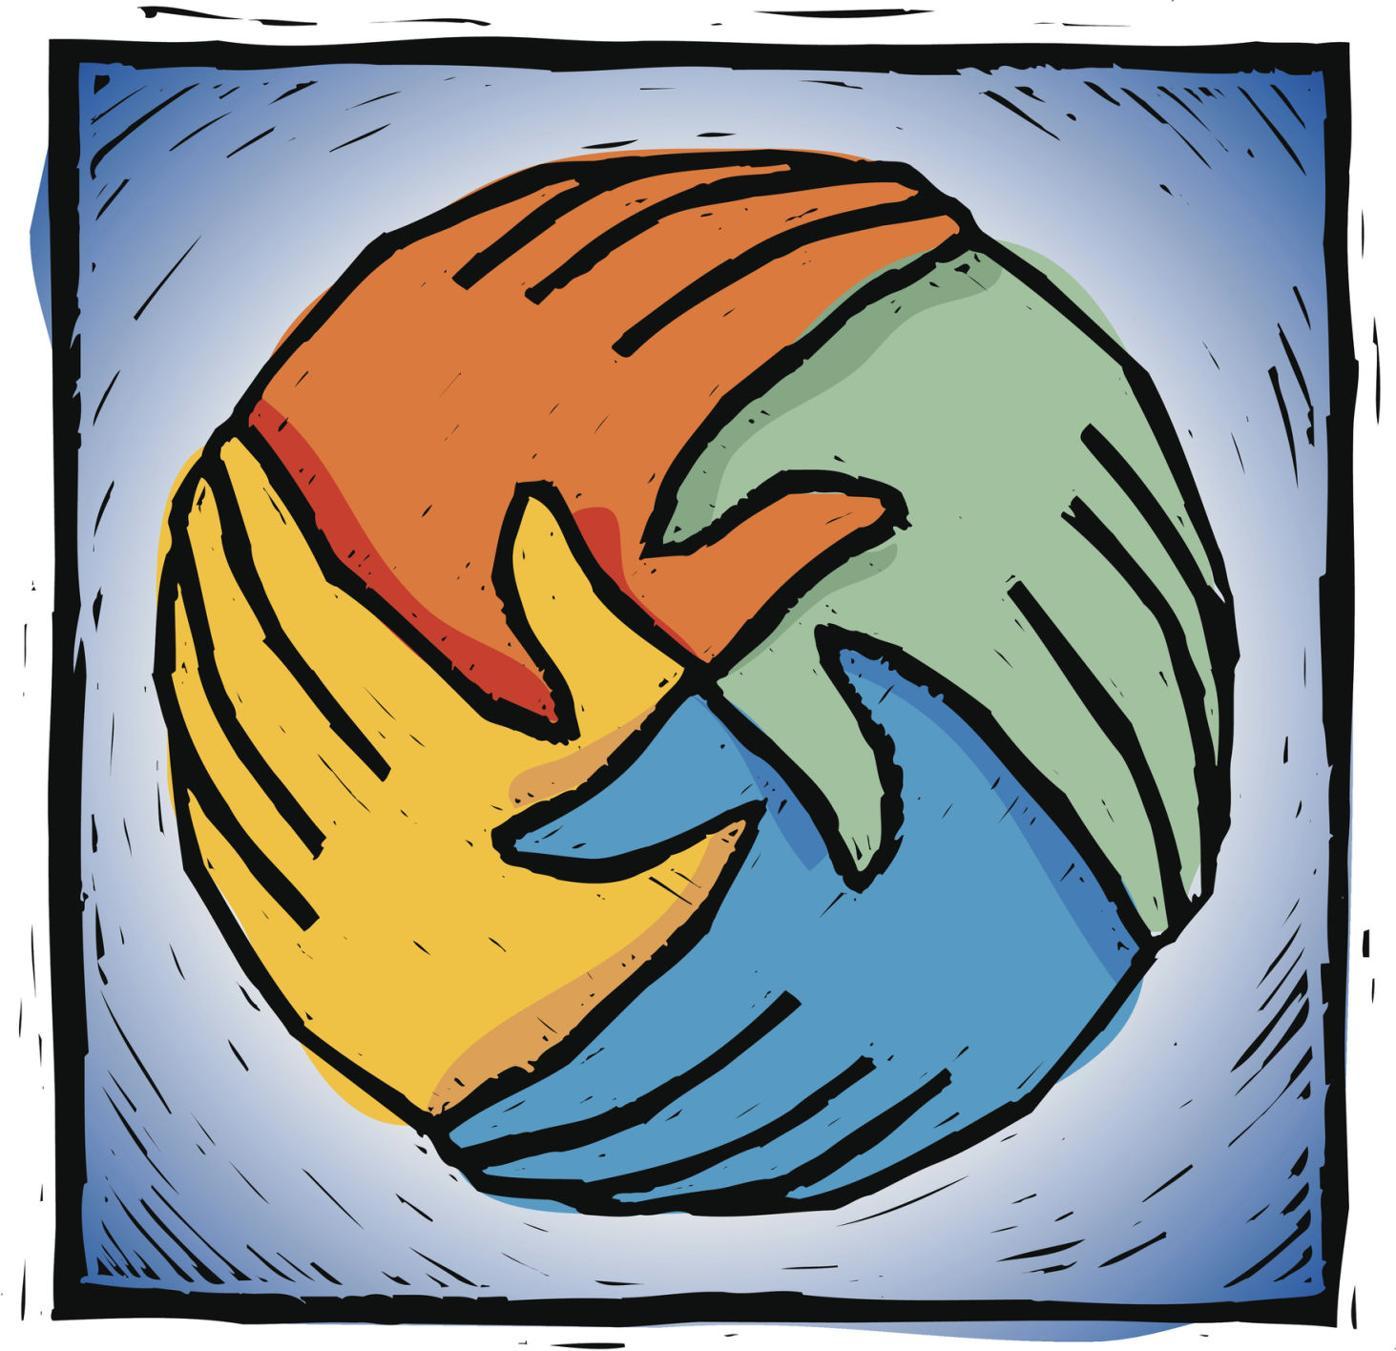 world holding hands logo